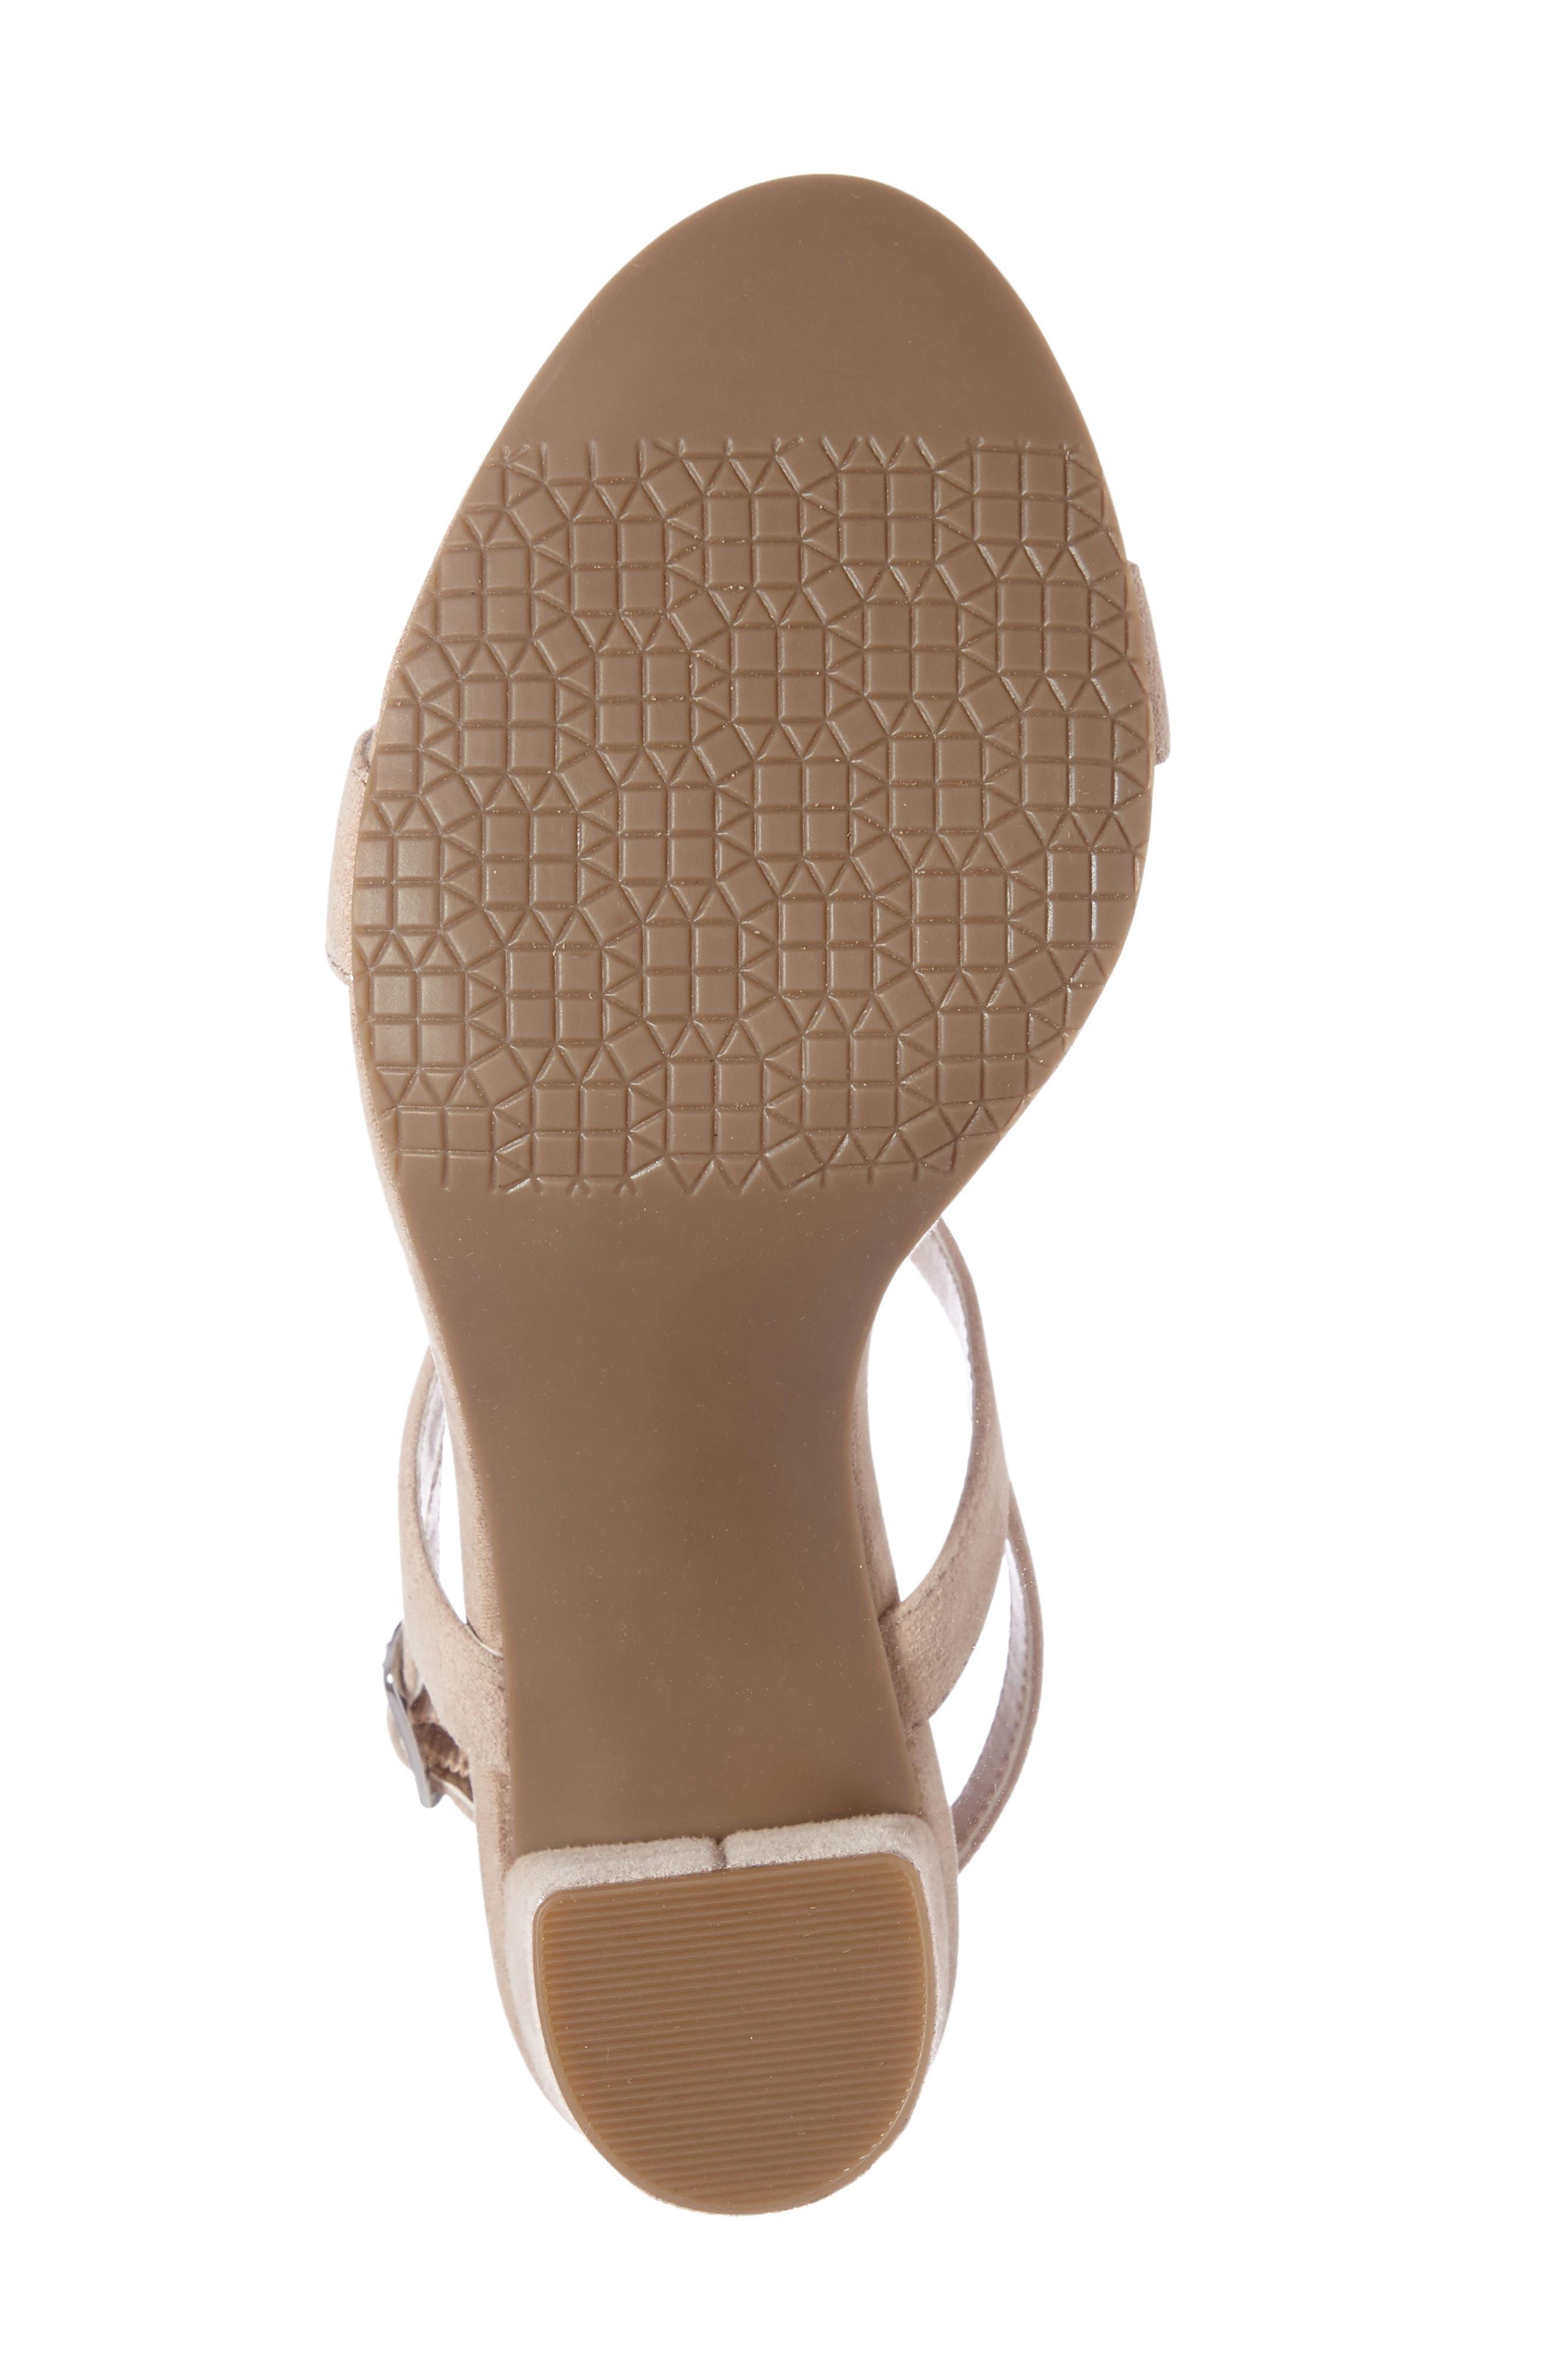 BP., Lula Block Heel Slingback Sandal, Alternate thumbnail 4, color, BLUSH SUEDE